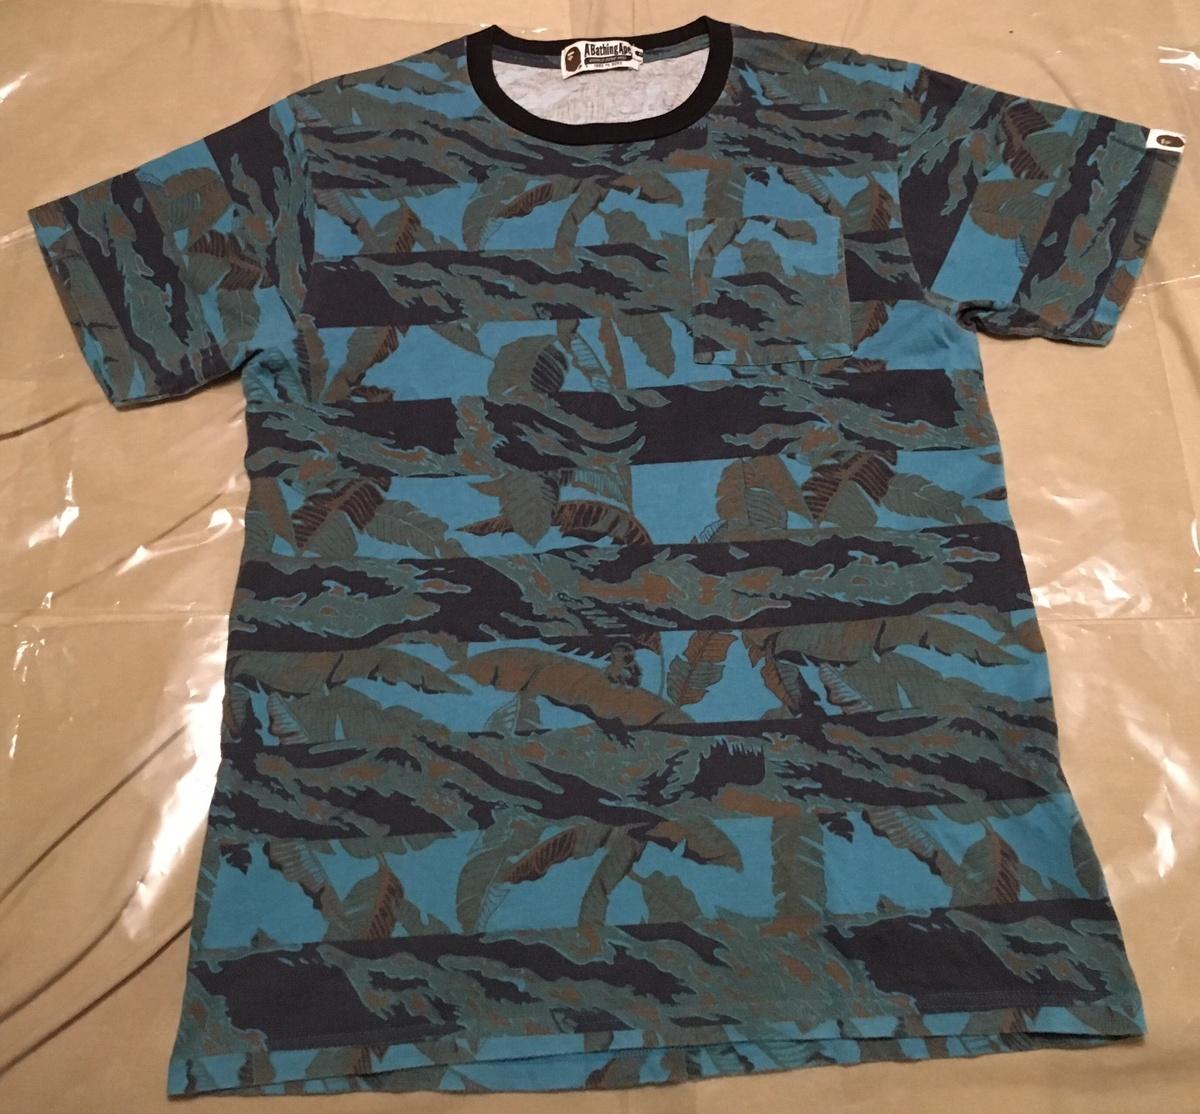 Bape bape camo tee size m short sleeve t shirts for sale for Bape t shirt sizing